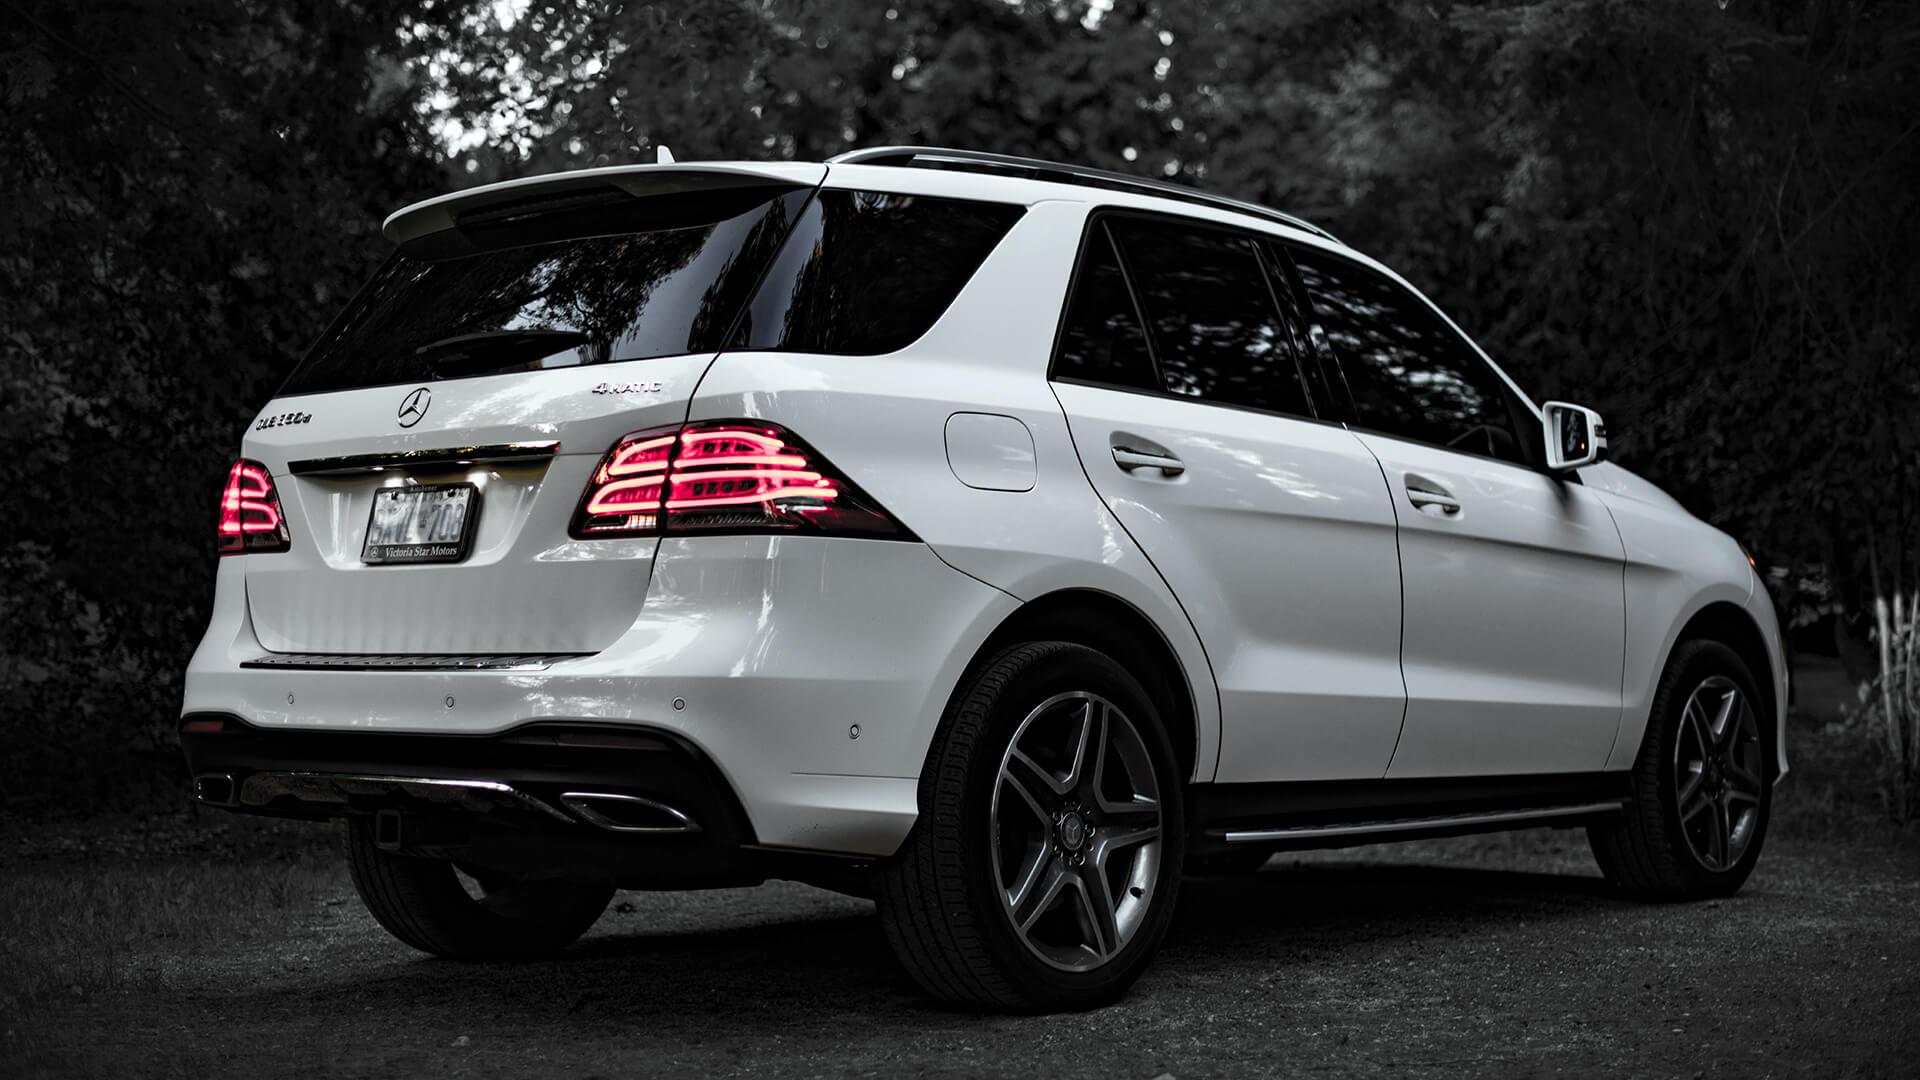 GLE W167 Mercedes-Benz.